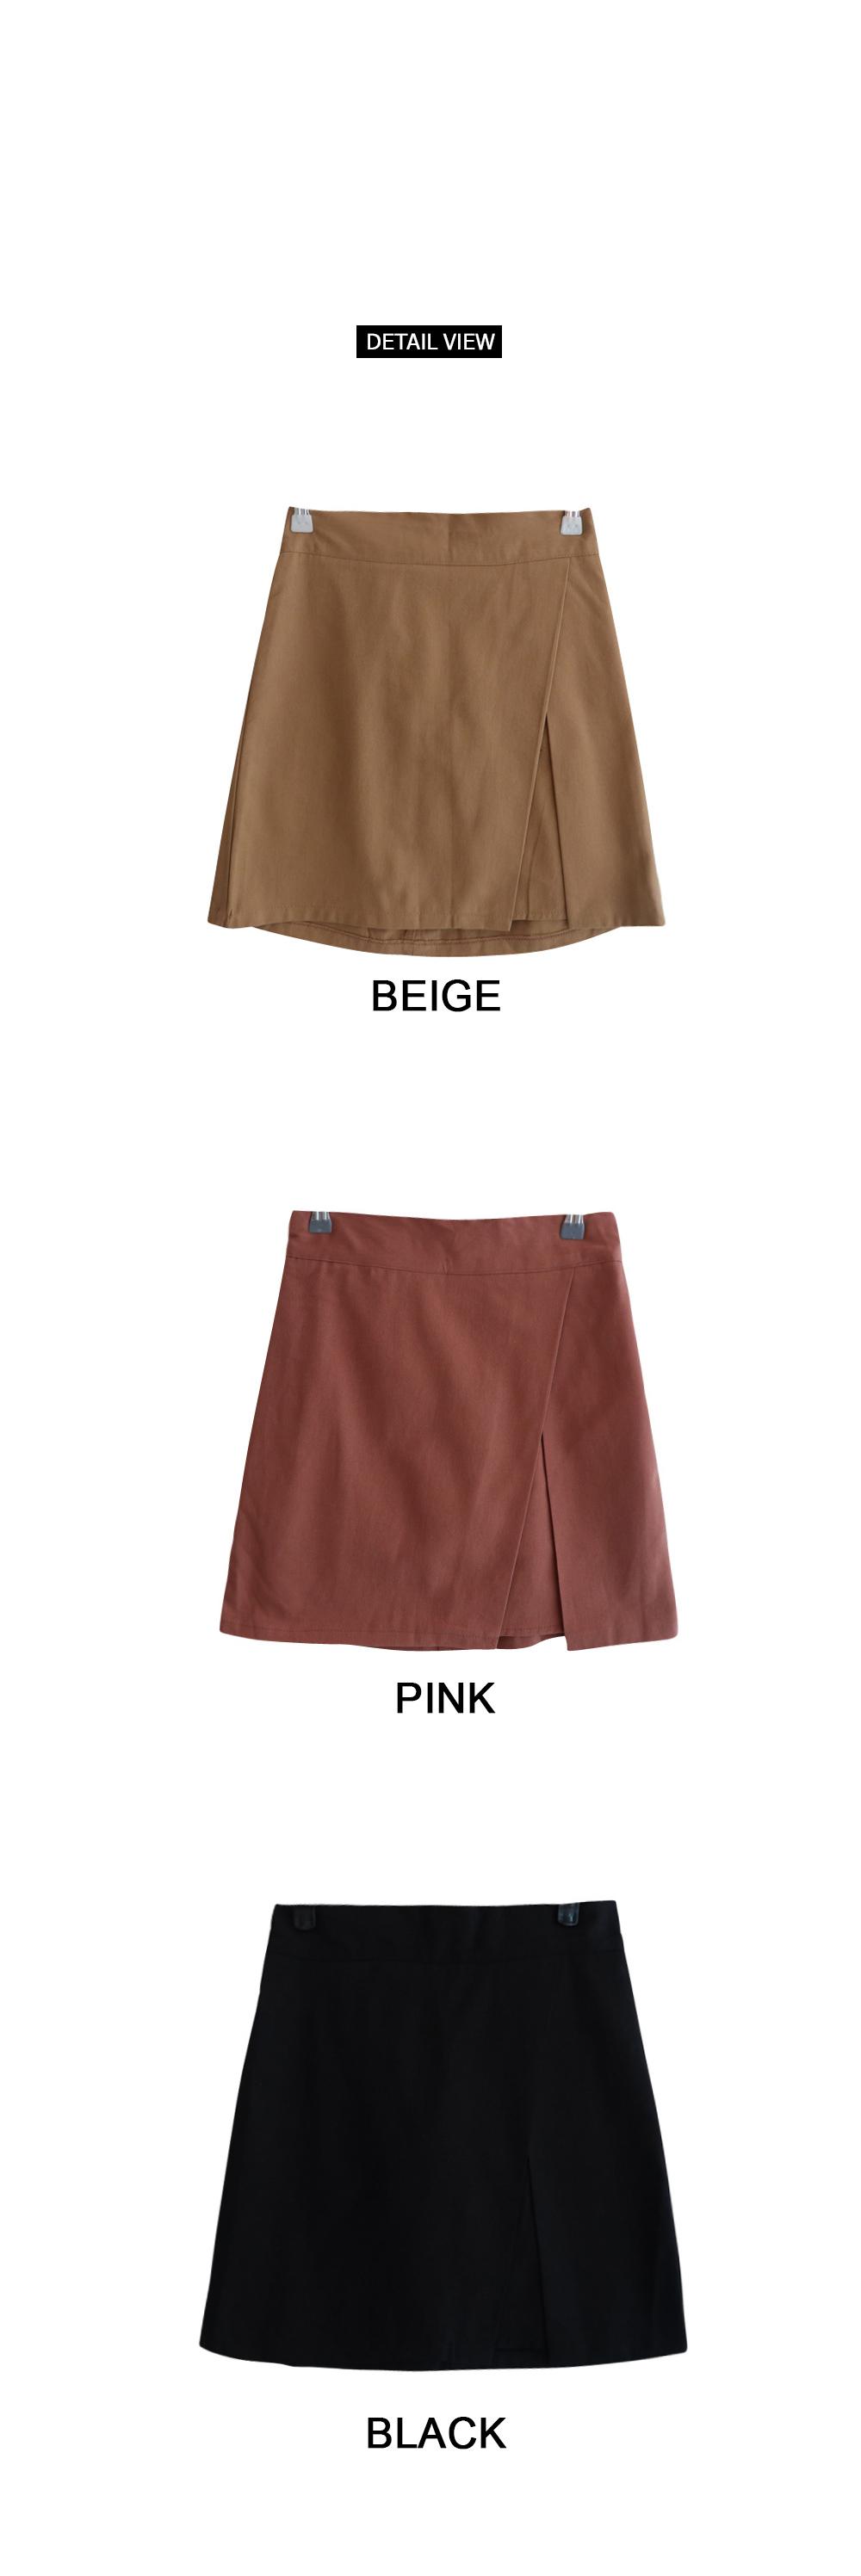 Trimmed wrap skirt